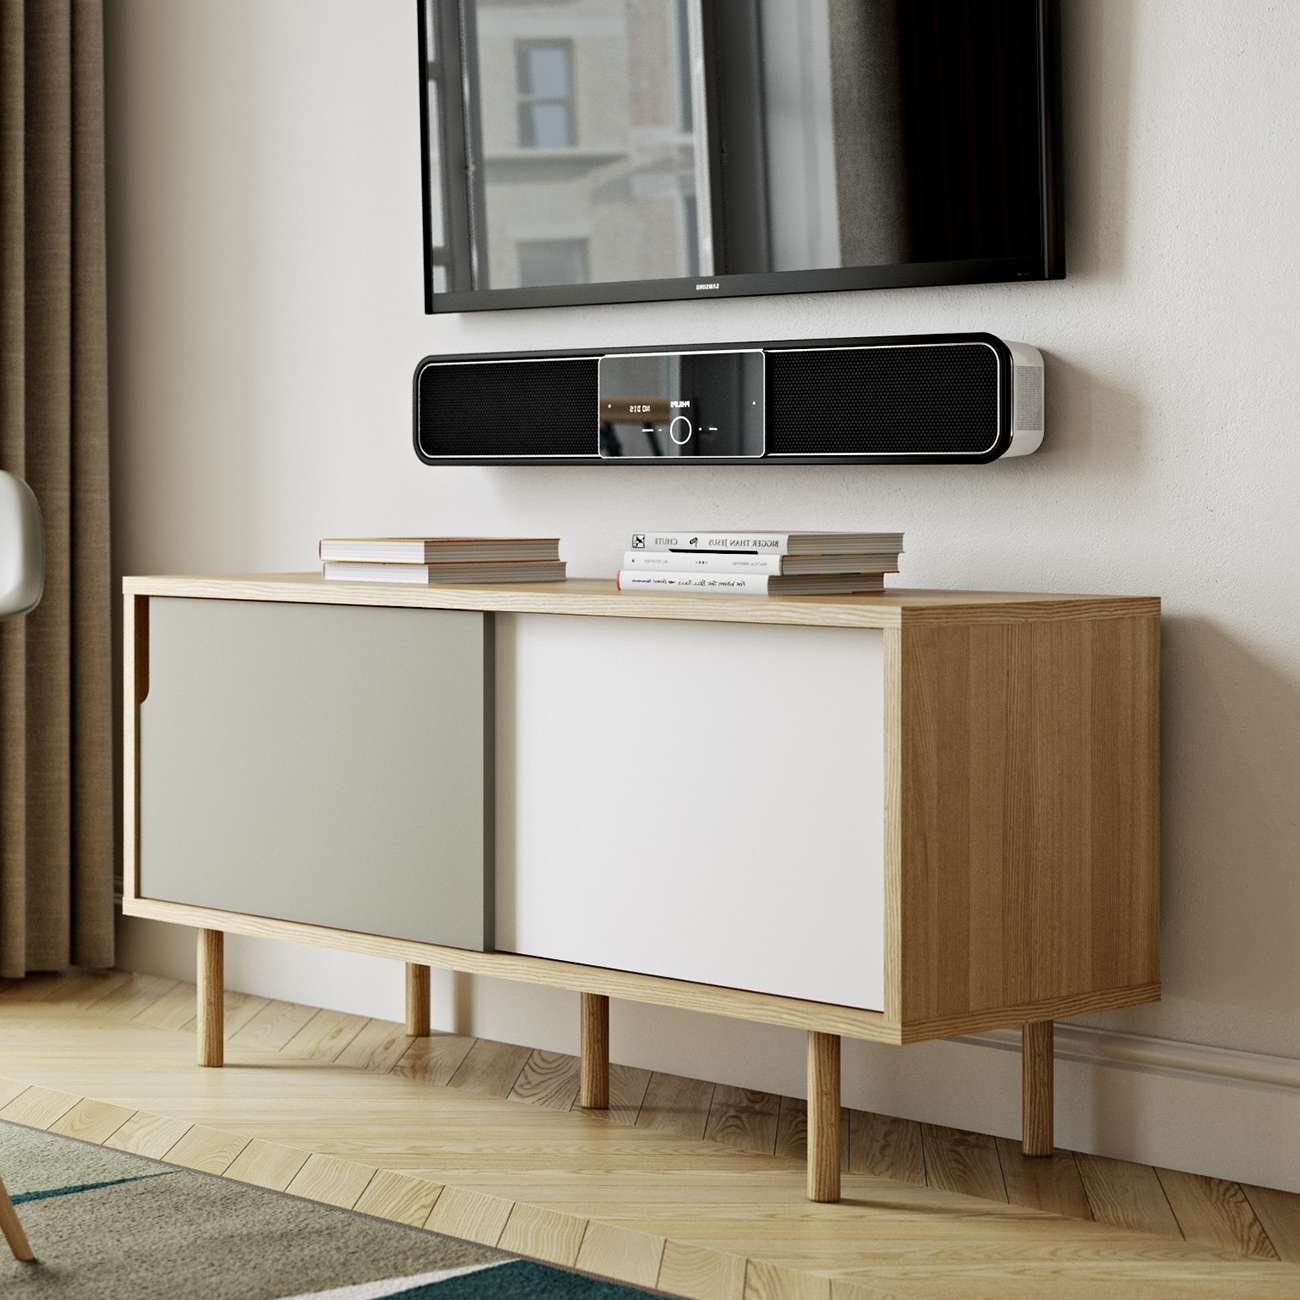 Dann Tv Stand | Oak / Pure White / Grey, Tema Home – Modern Manhattan Throughout Tv Stands In Oak (View 6 of 15)